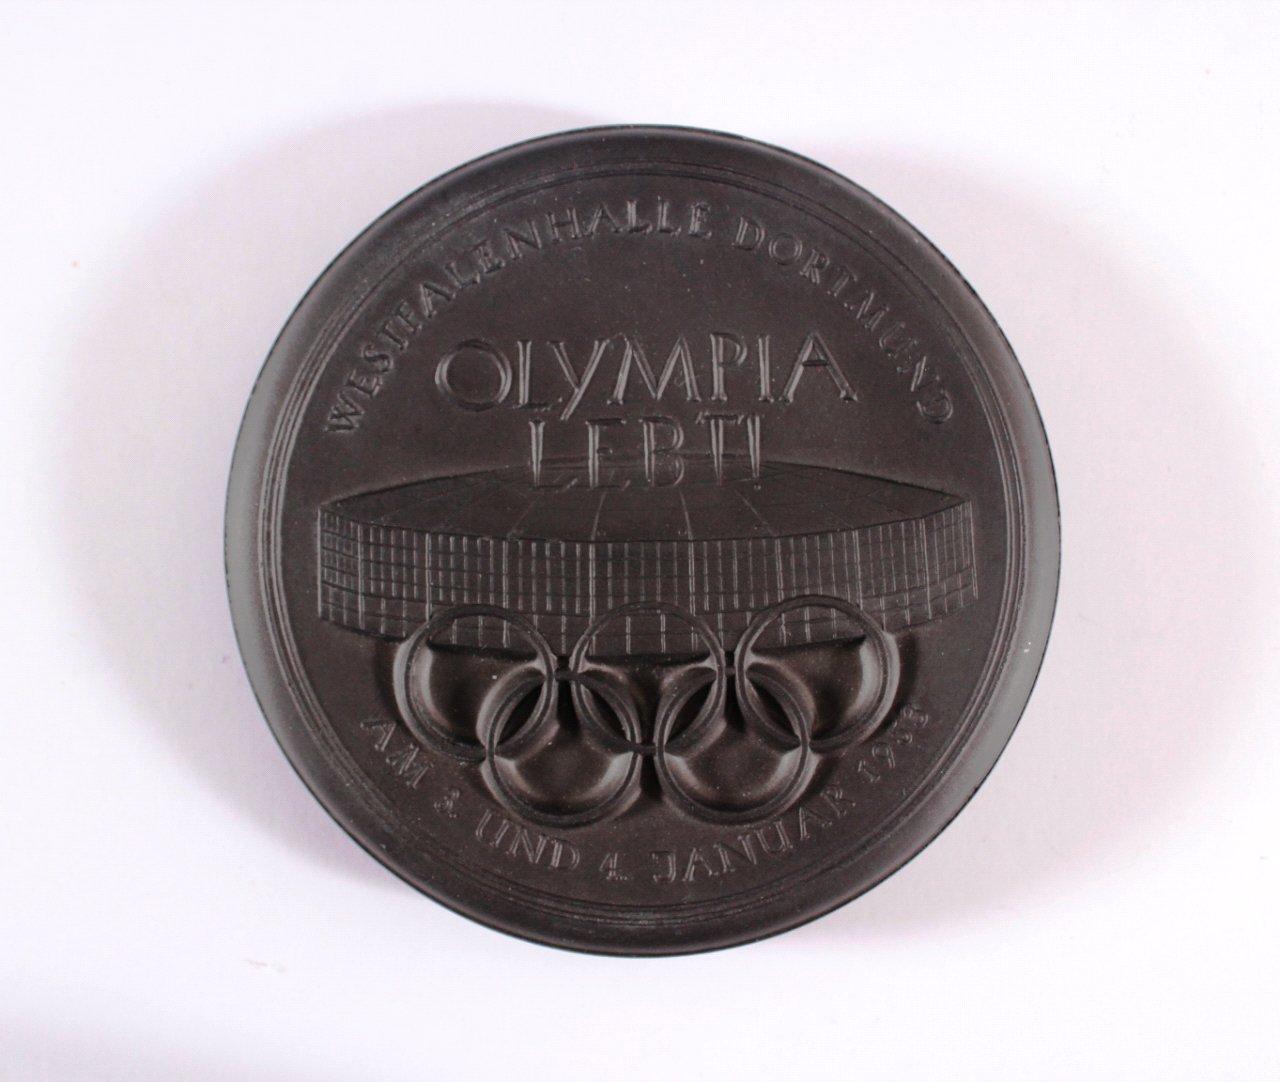 Kohlenmedaille Olympia lebt 1953